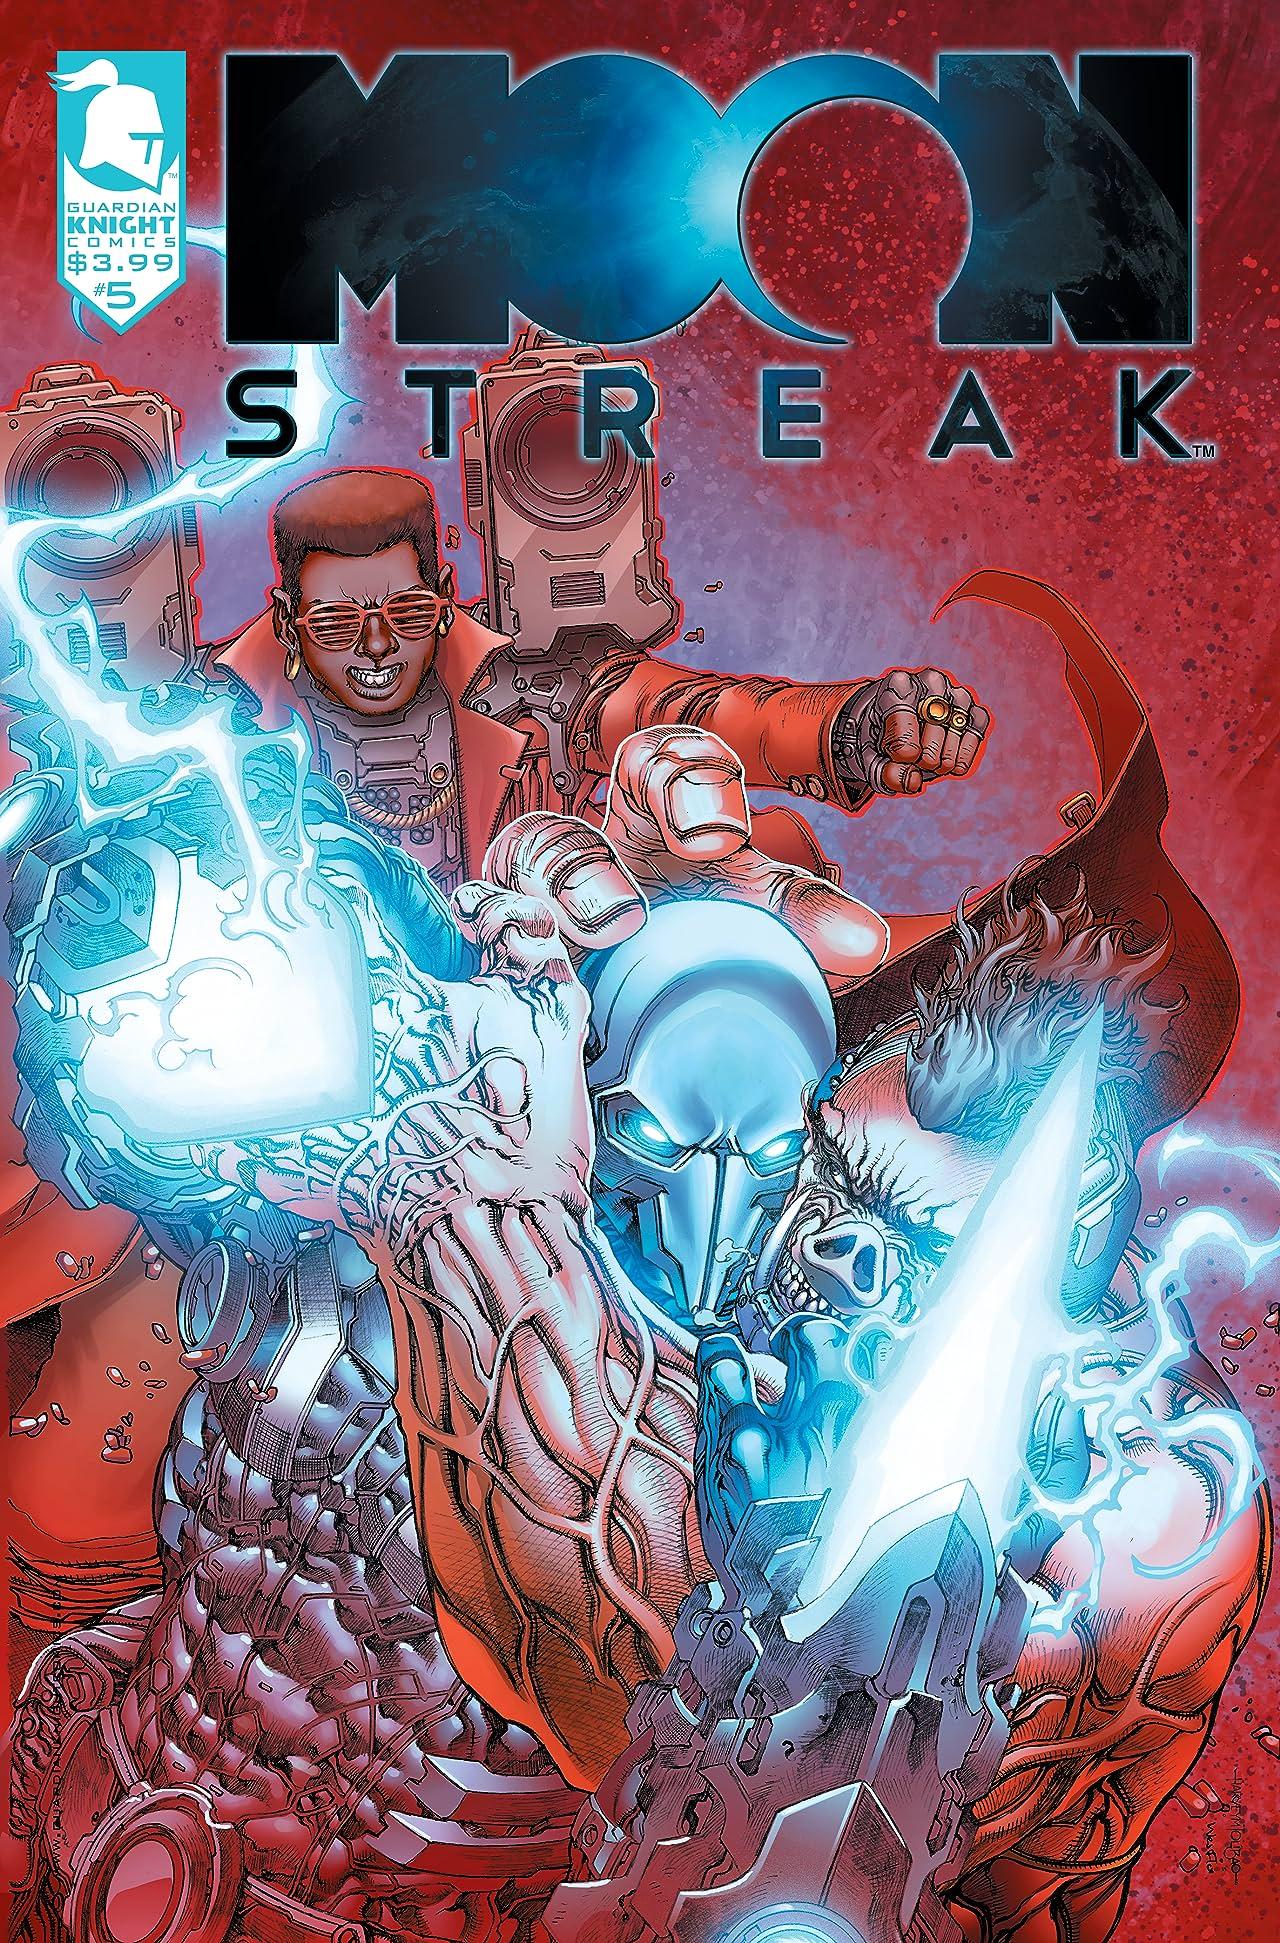 Moon Streak #5